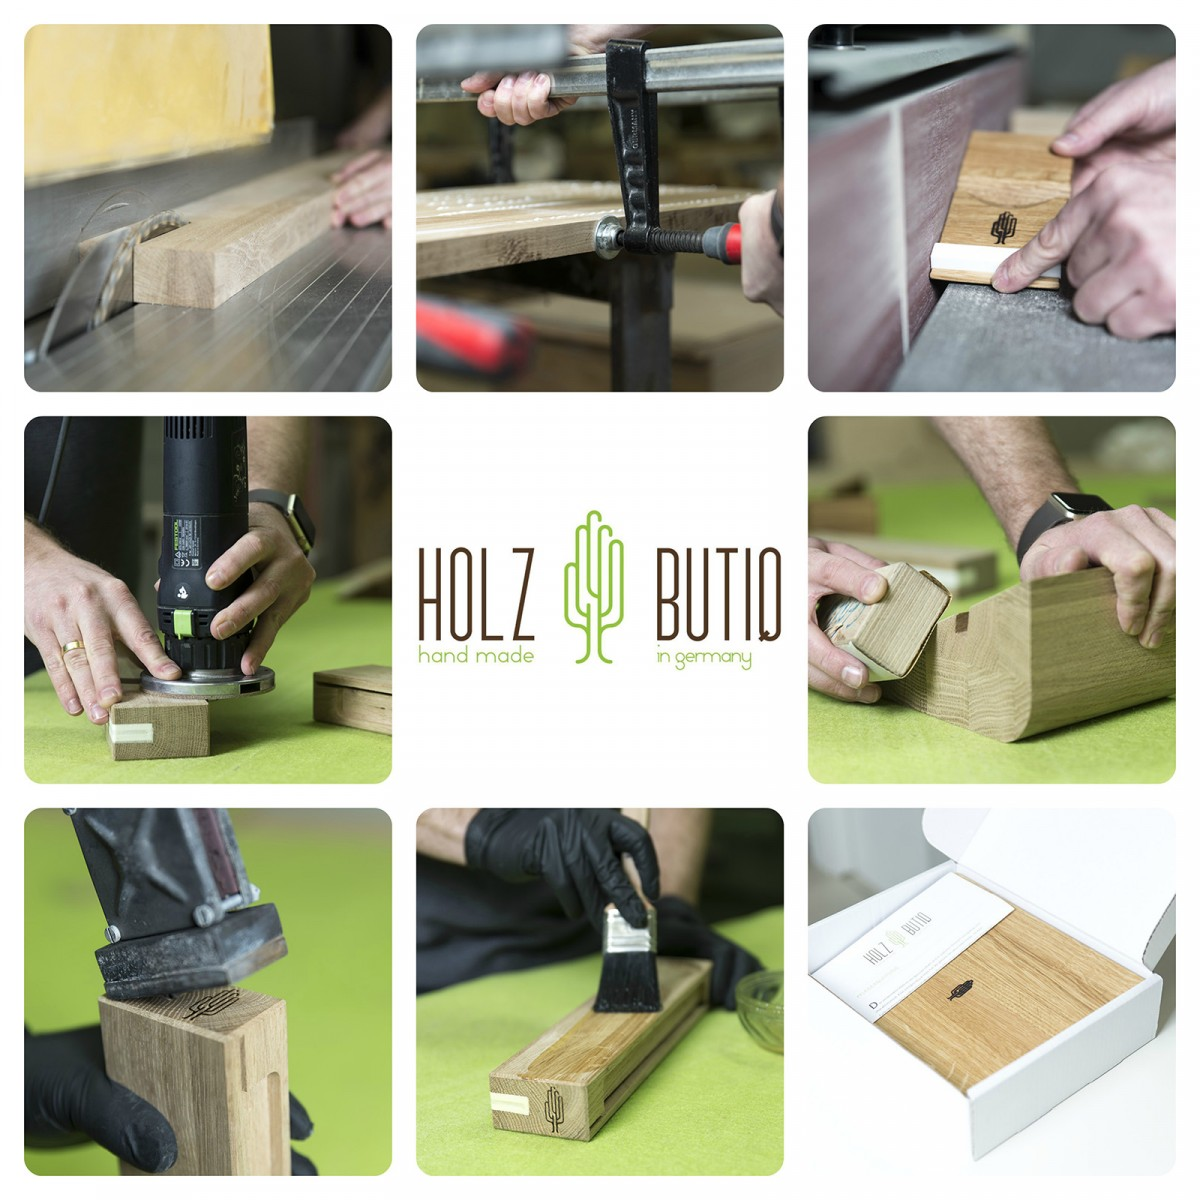 Holzhocker tabureto granda, Massivholz Design Hocker | Holzbutiq